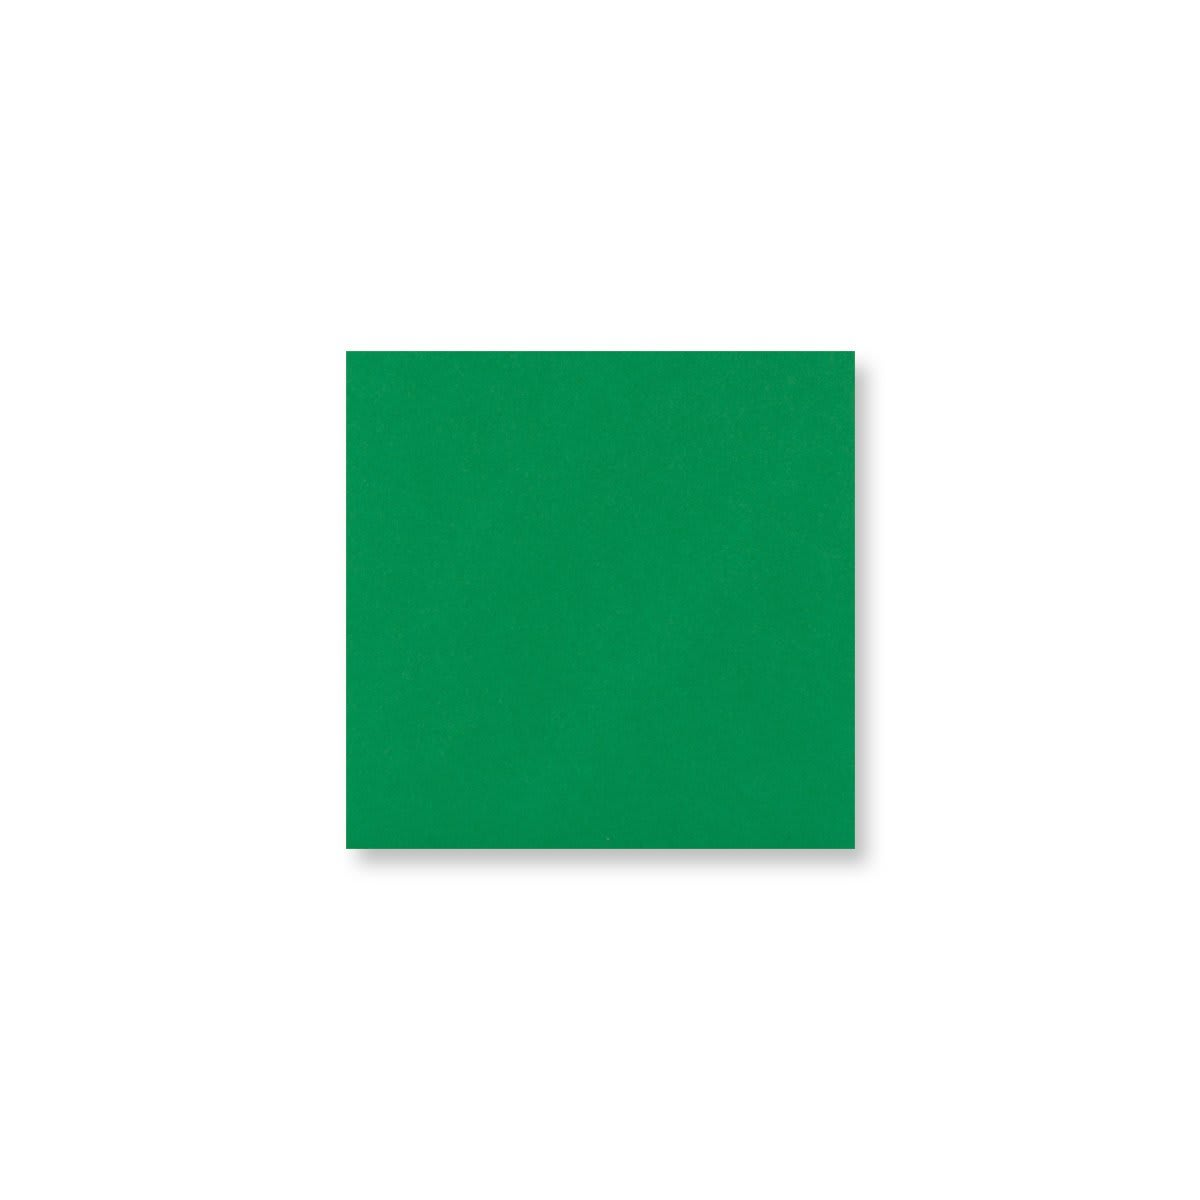 110 x 110mm DARK GREEN ENVELOPES